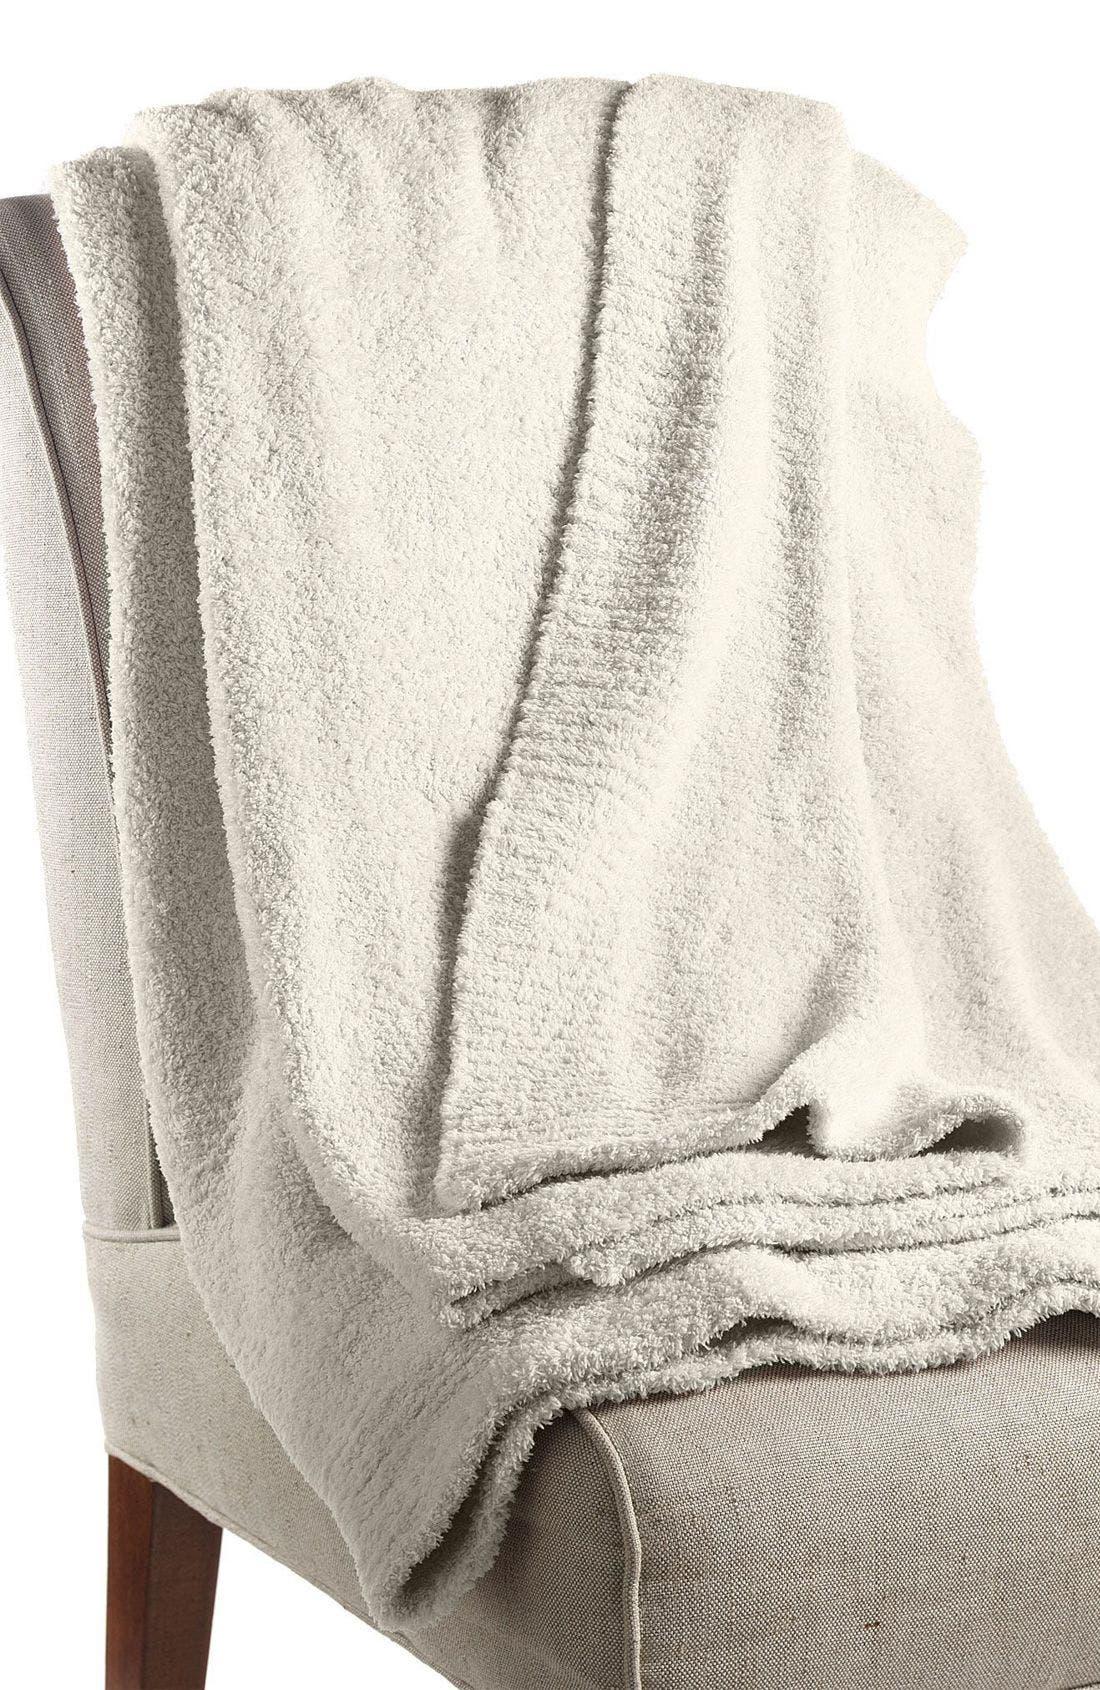 Main Image - Barefoot Dreams® Chic Blanket